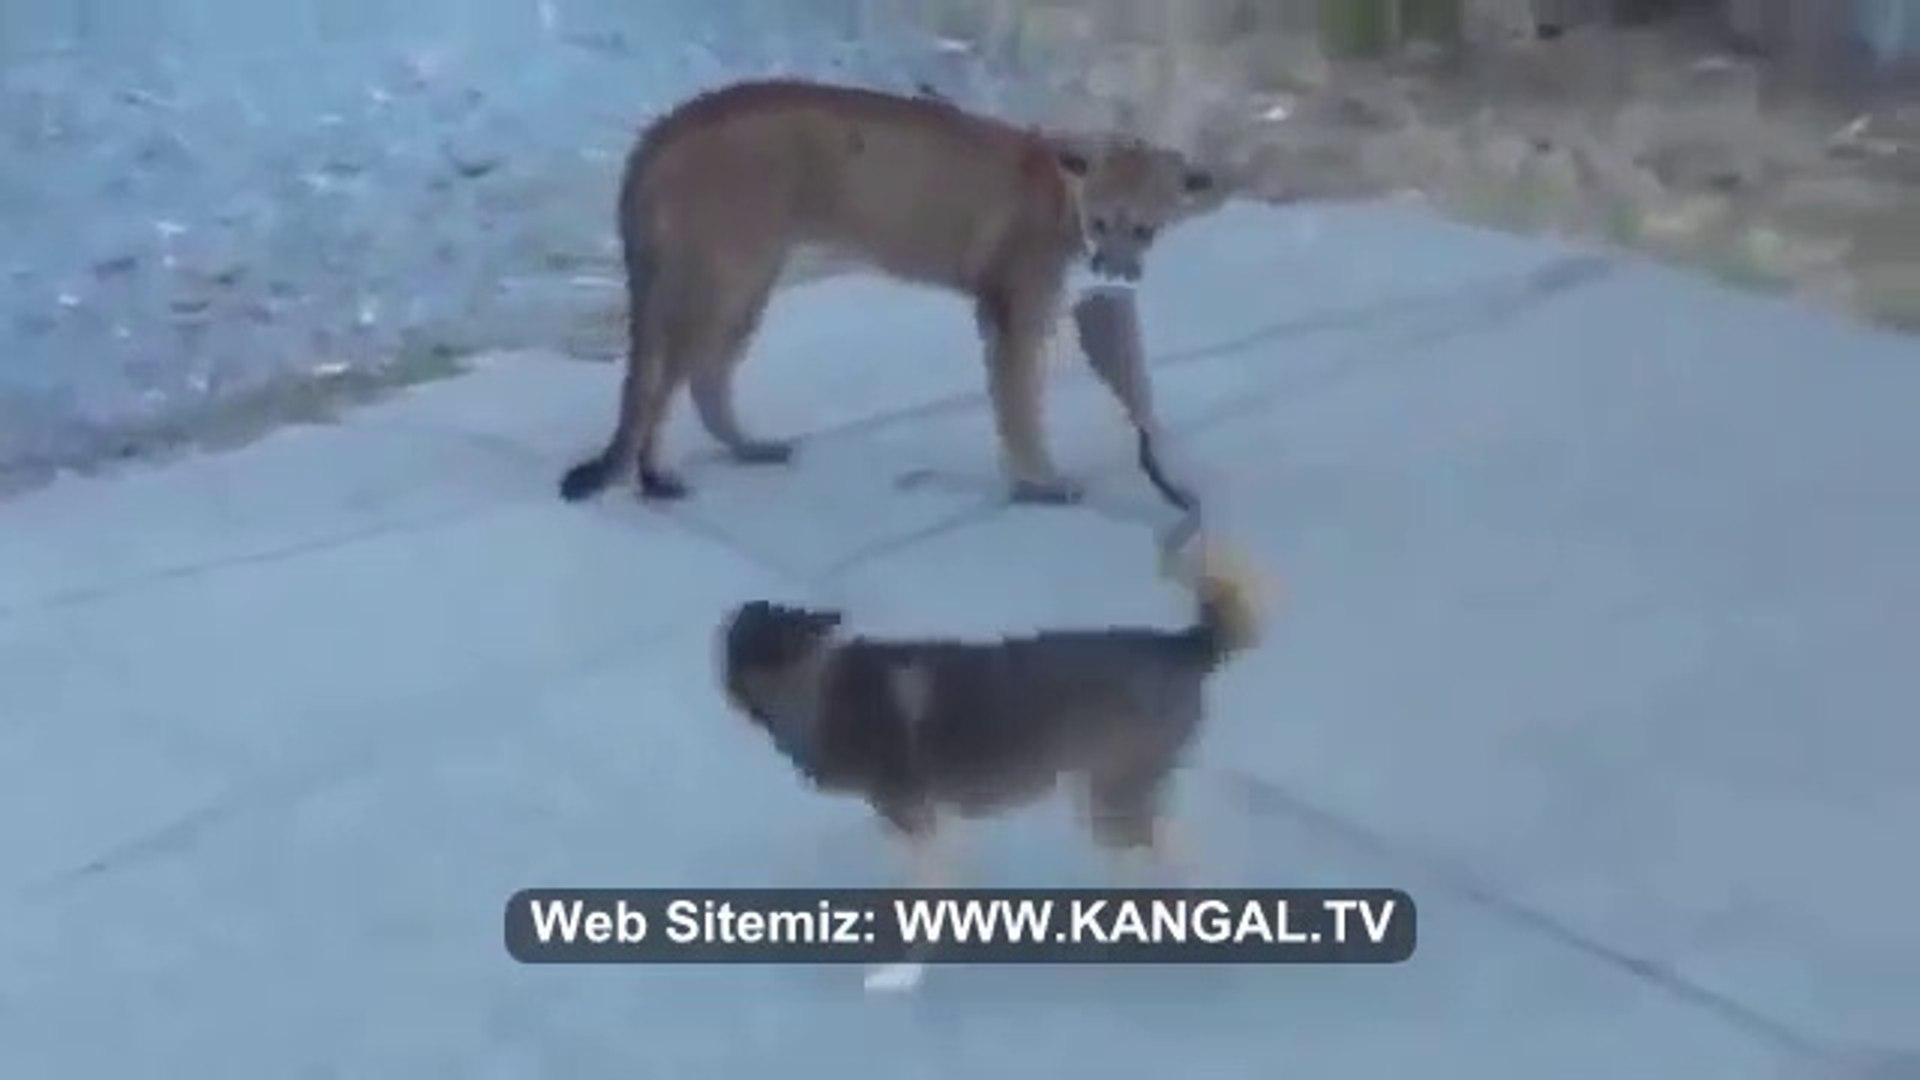 PUMA vs SiBiRYA KURDU ve ALMAN KURDU - PUMA vs SiBERiAN HUSKY and GERMAN SHEPHERD DOG